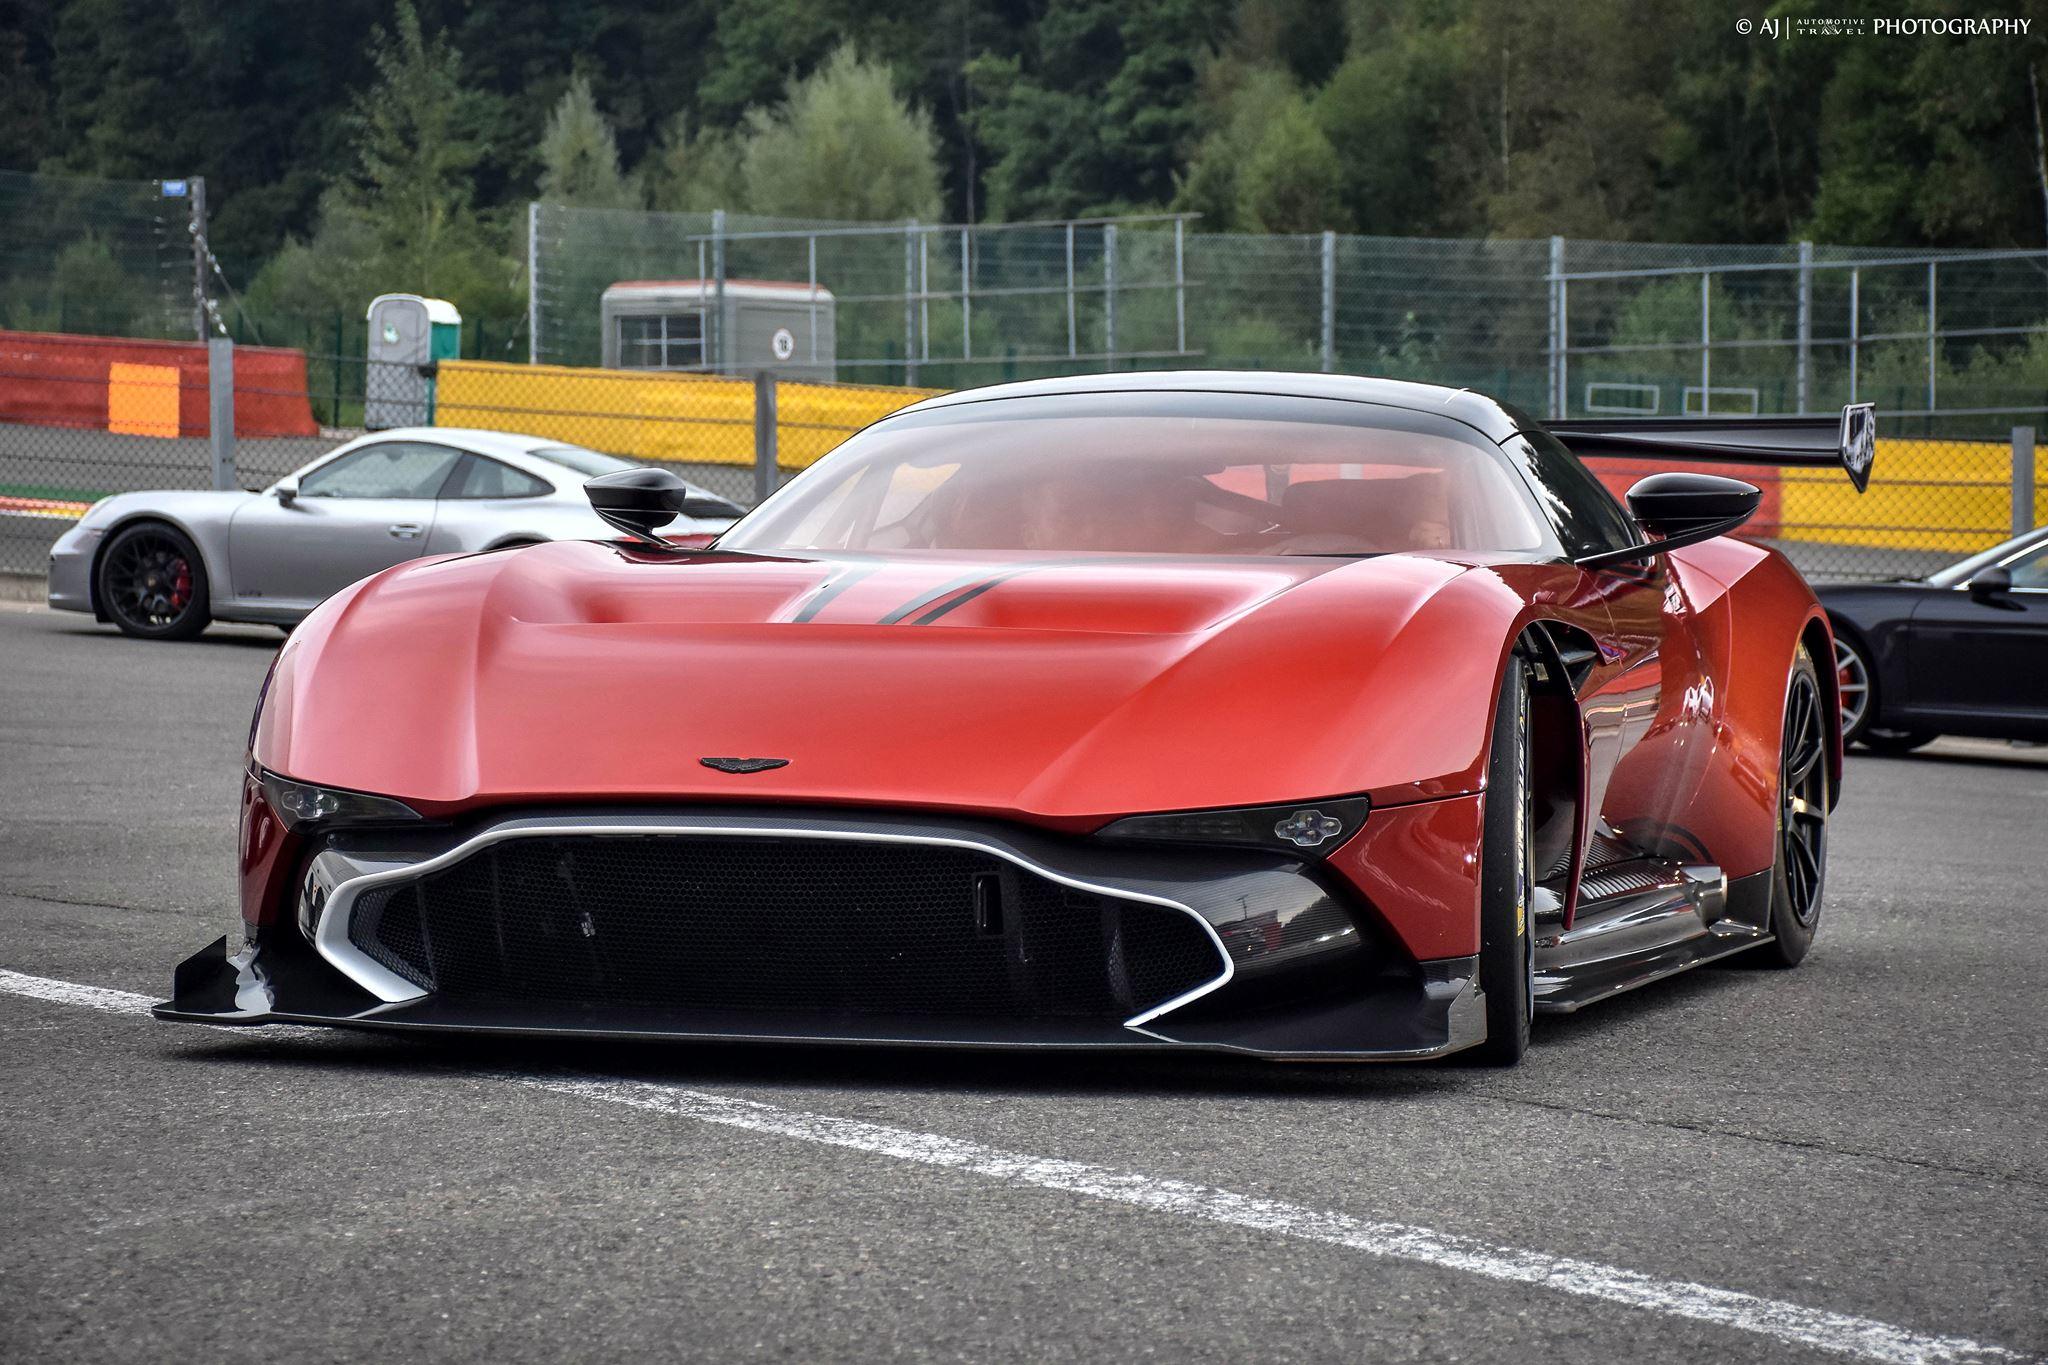 Gallery: Aston Martin Vulcan Attack at Spa-Francorchamps - GTspirit